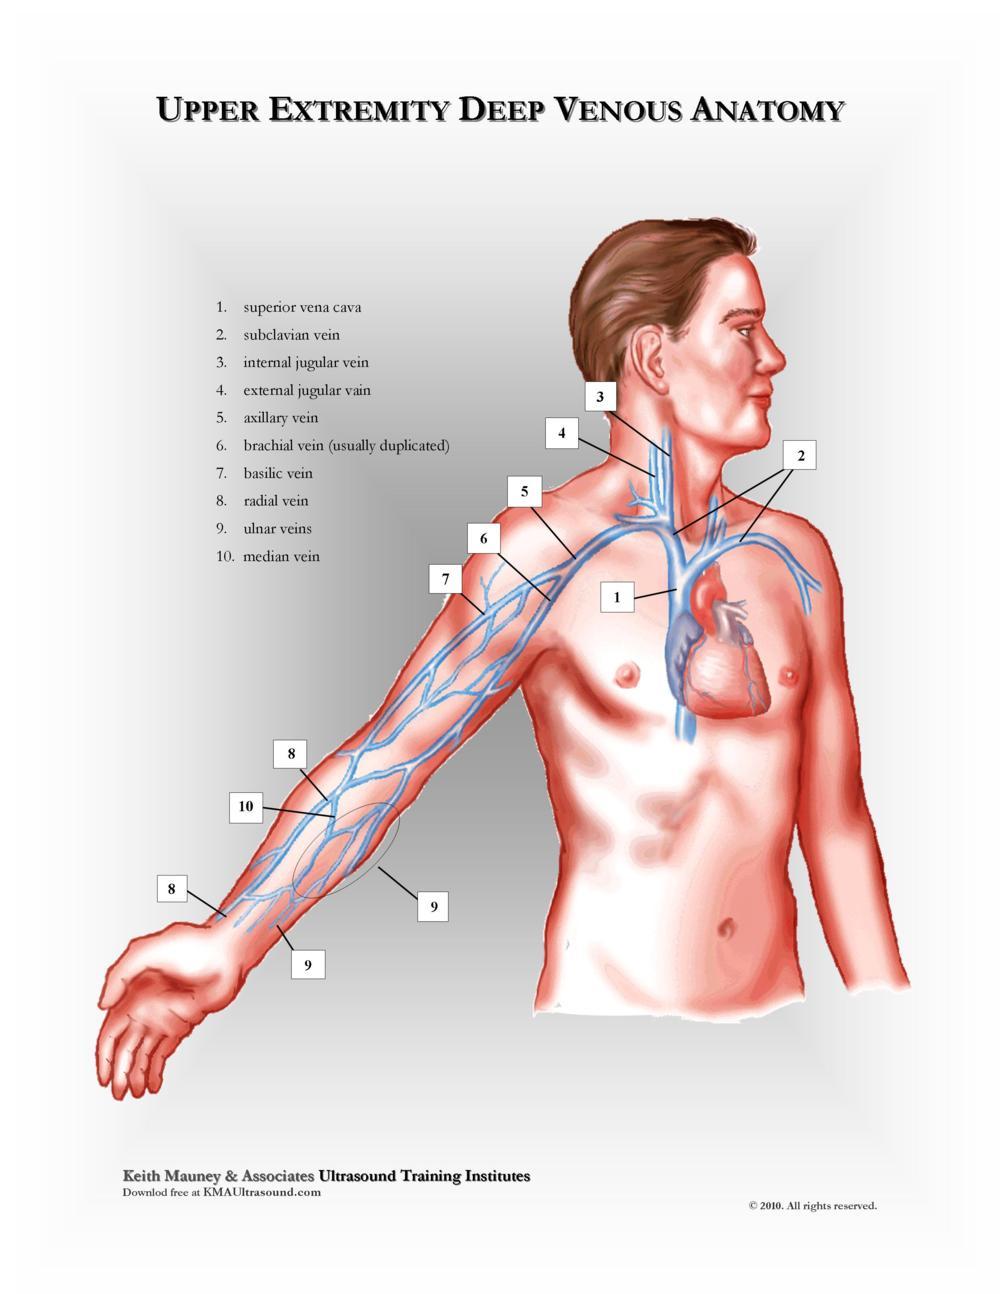 KMA Ultrasound Upper Extremity Deep Venous Anatomy